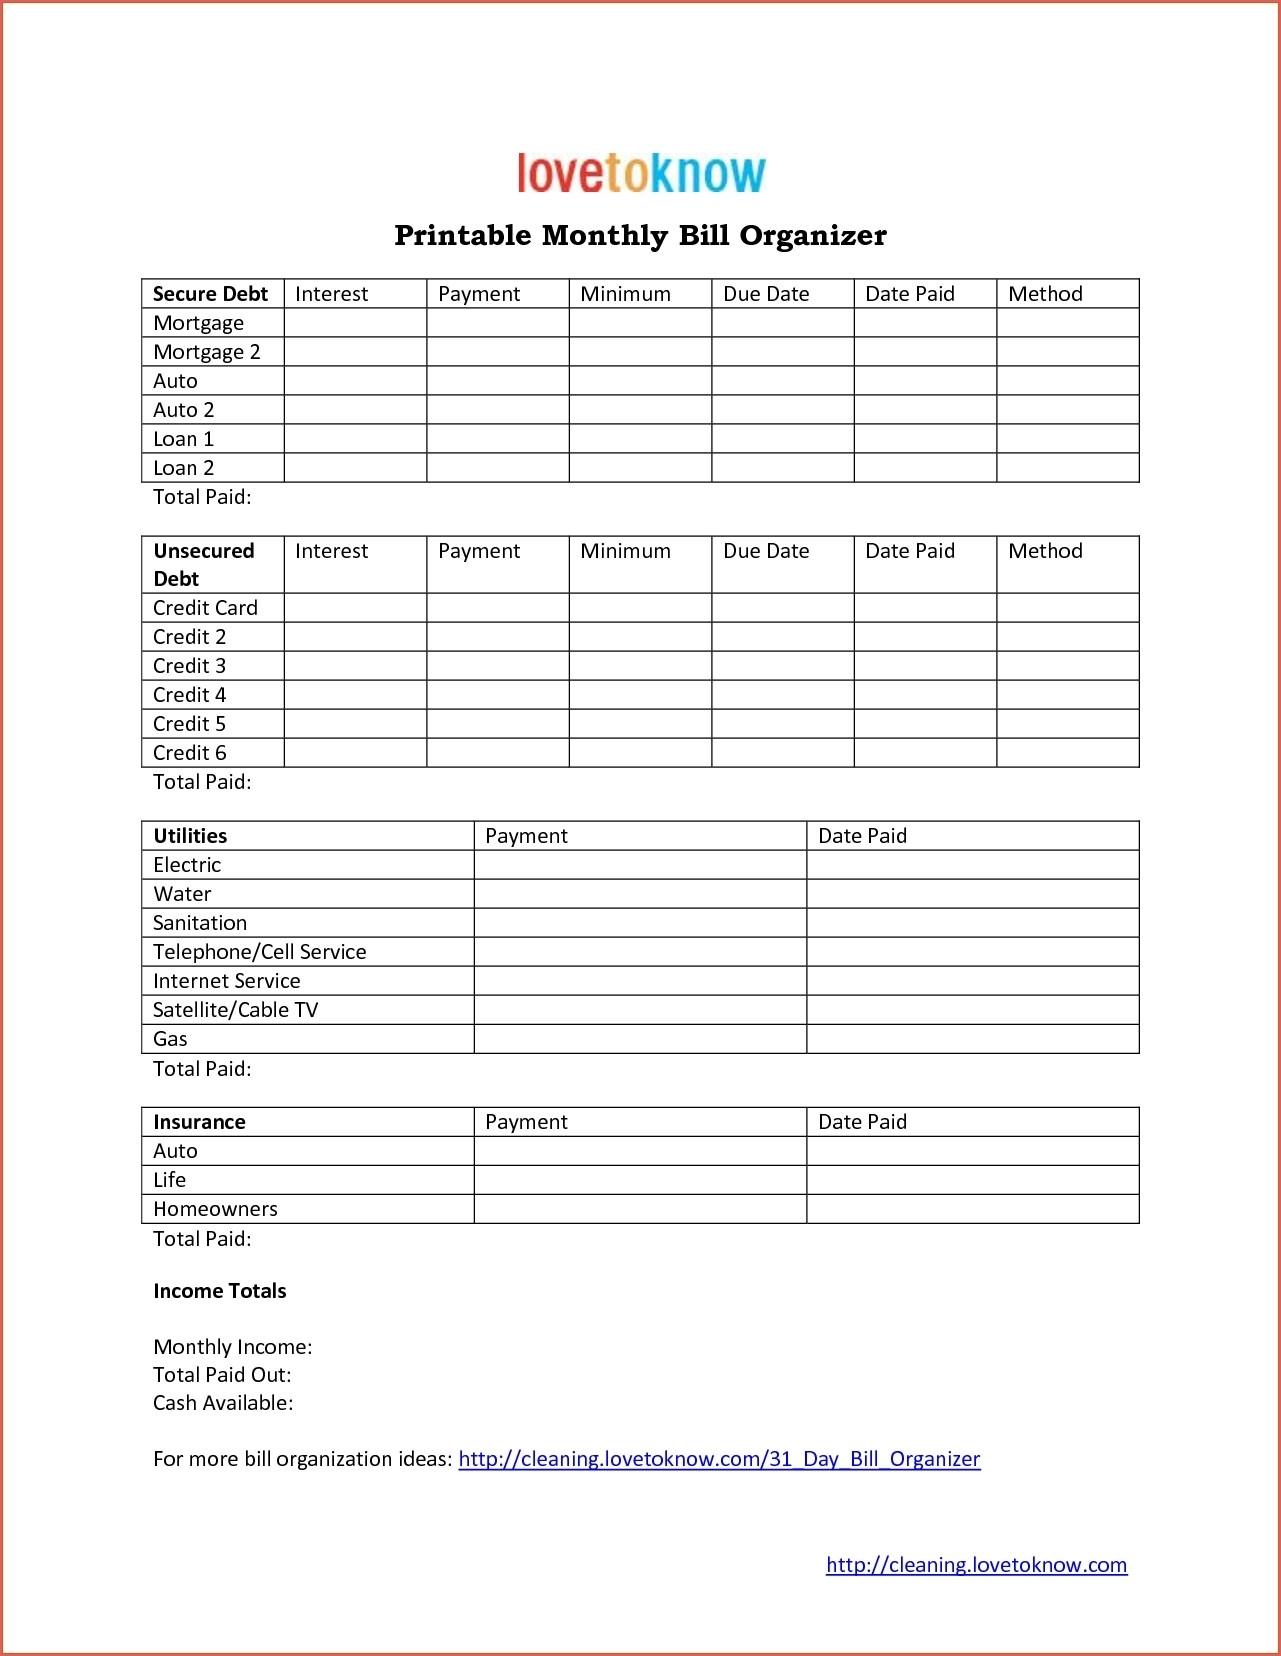 Printable Monthly Bill Calendar Bills Organizer Template Online regarding Printable Monthly Bill Pay Organizer